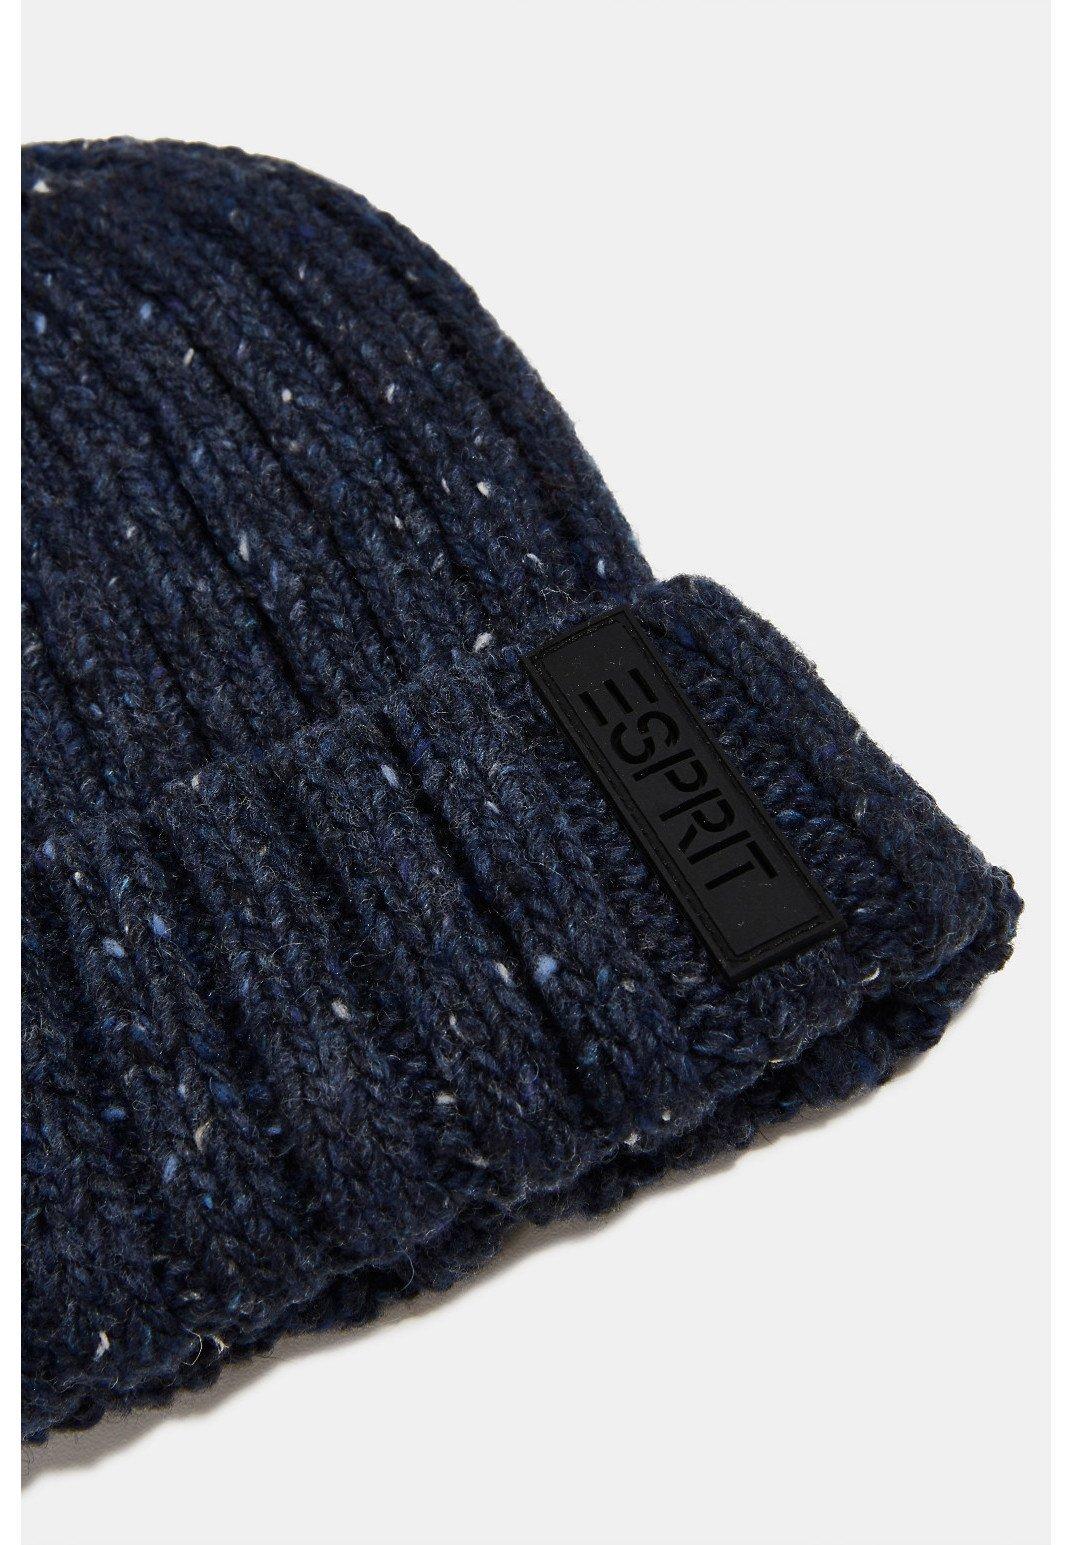 Esprit Mütze - Navy/dunkelblau